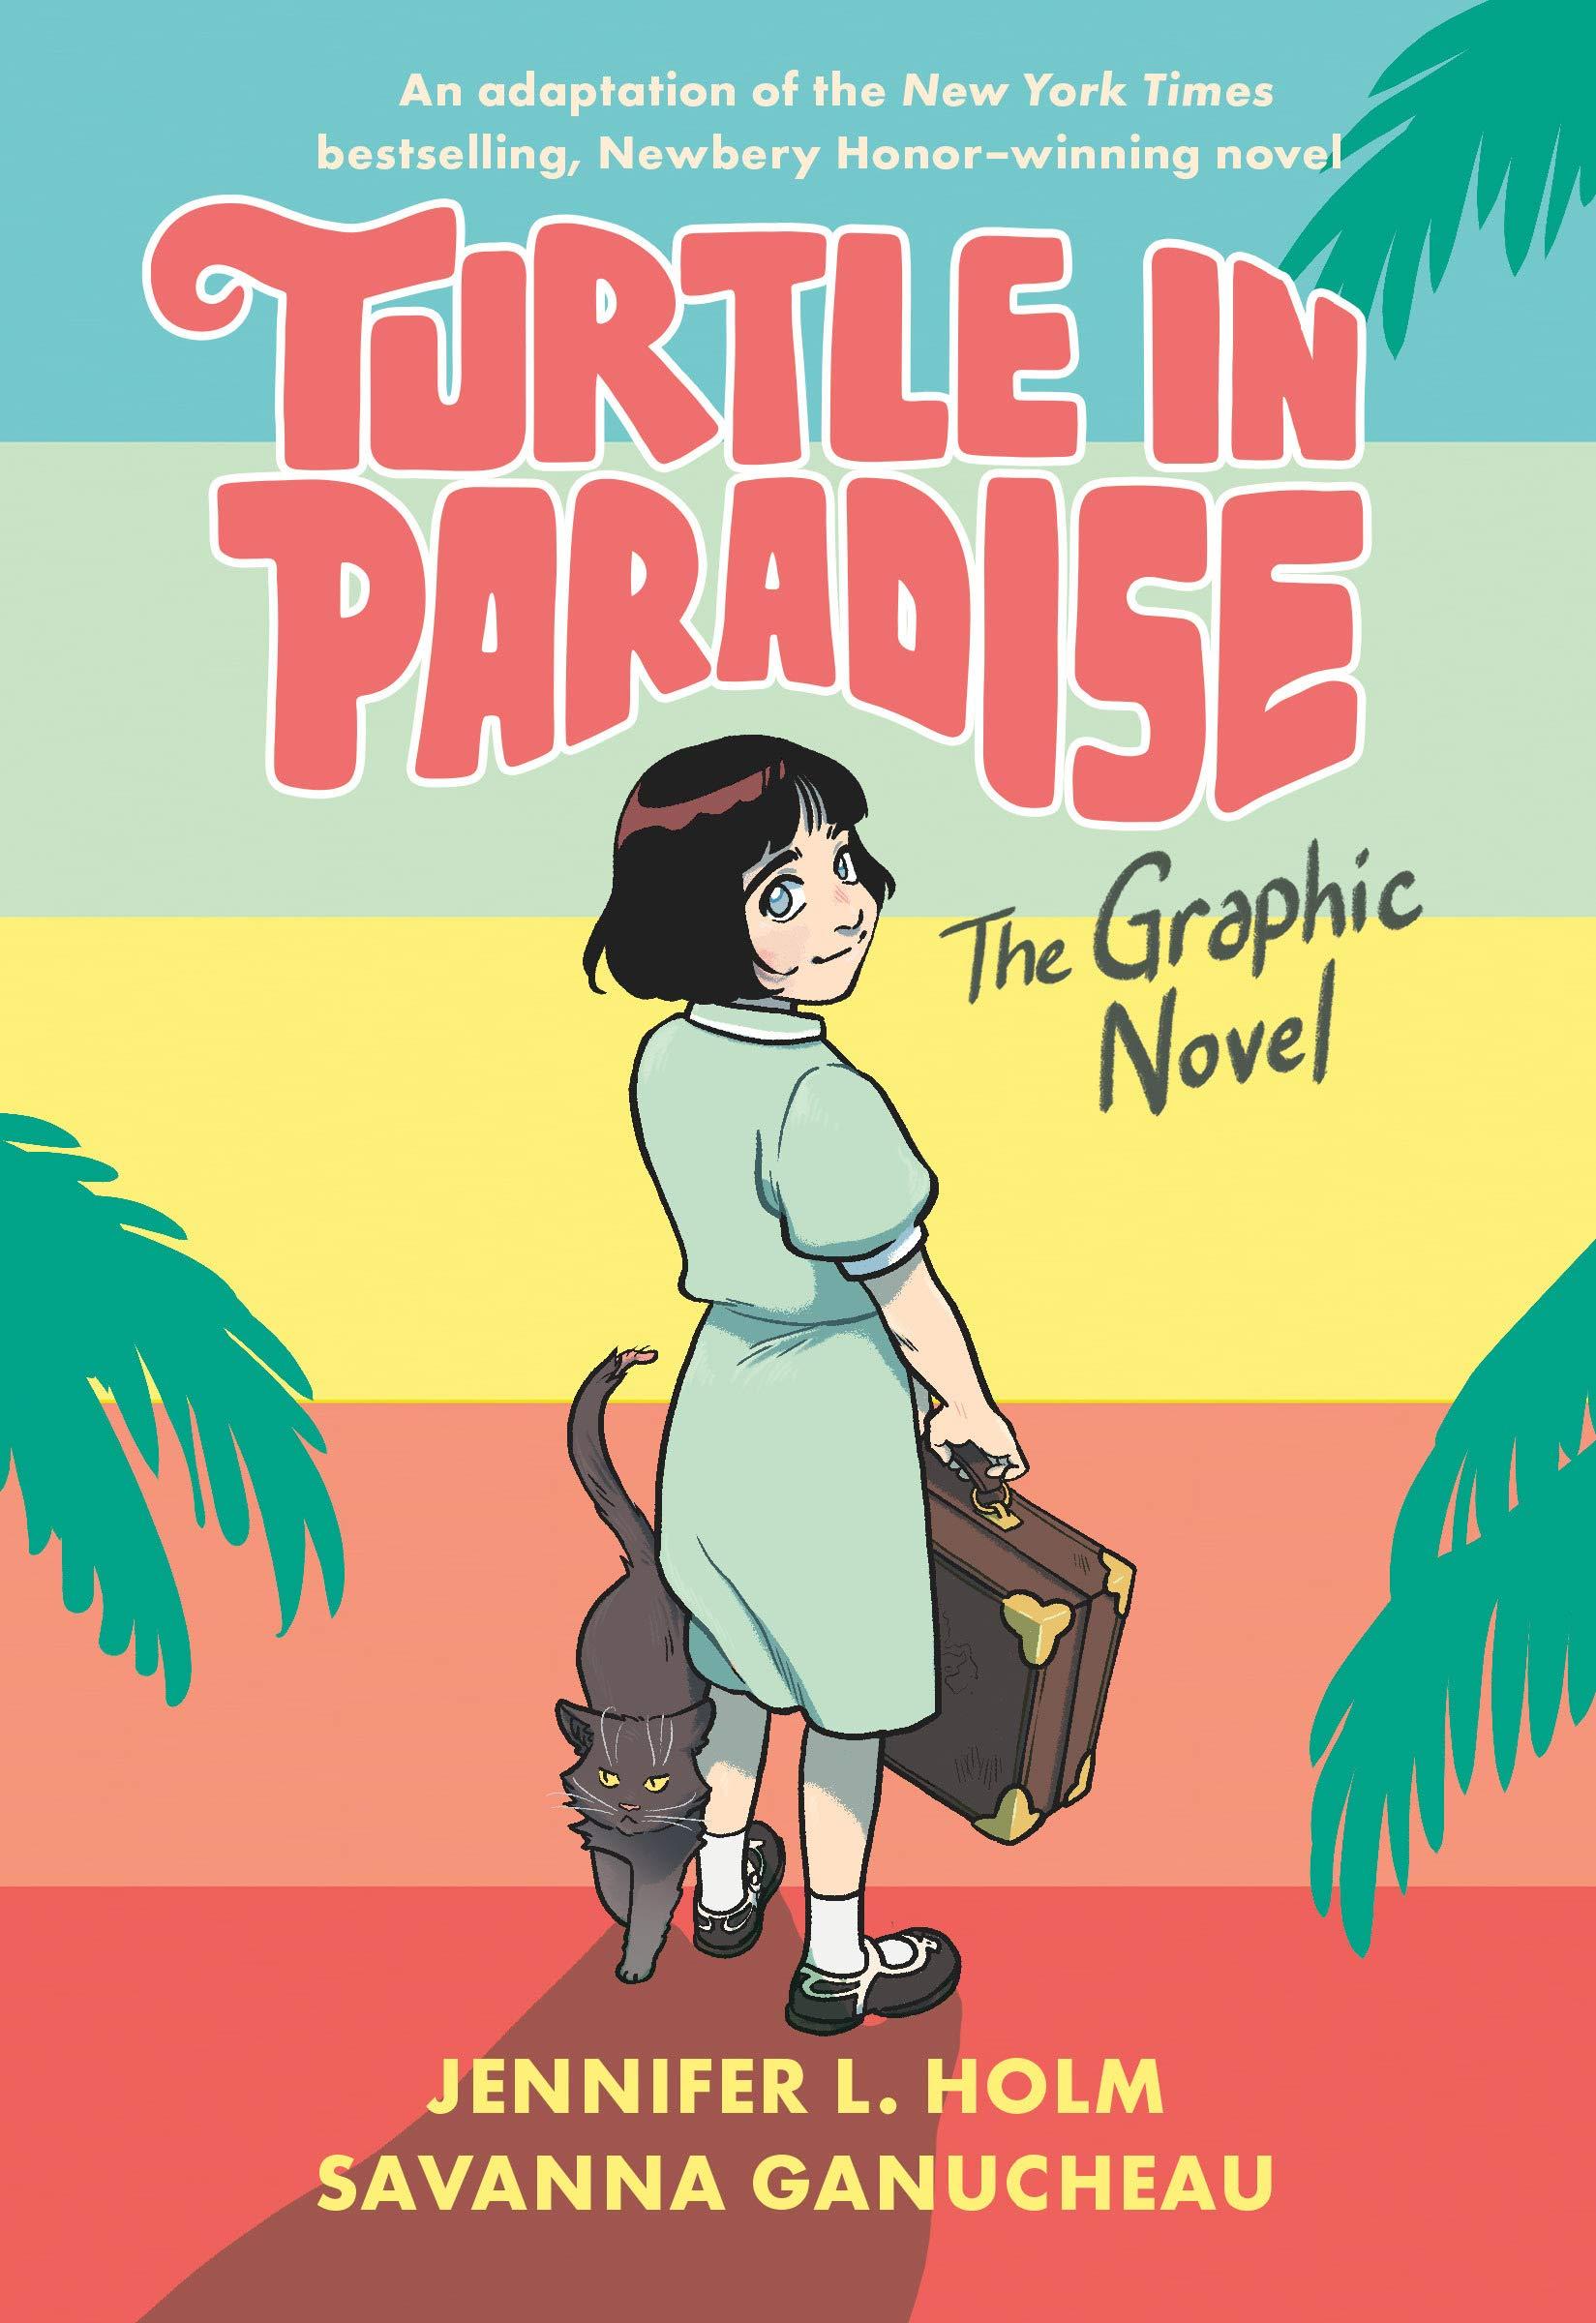 Amazon.com: Turtle in Paradise: The Graphic Novel (9780593126318): Holm,  Jennifer L., Ganucheau, Savanna: Books